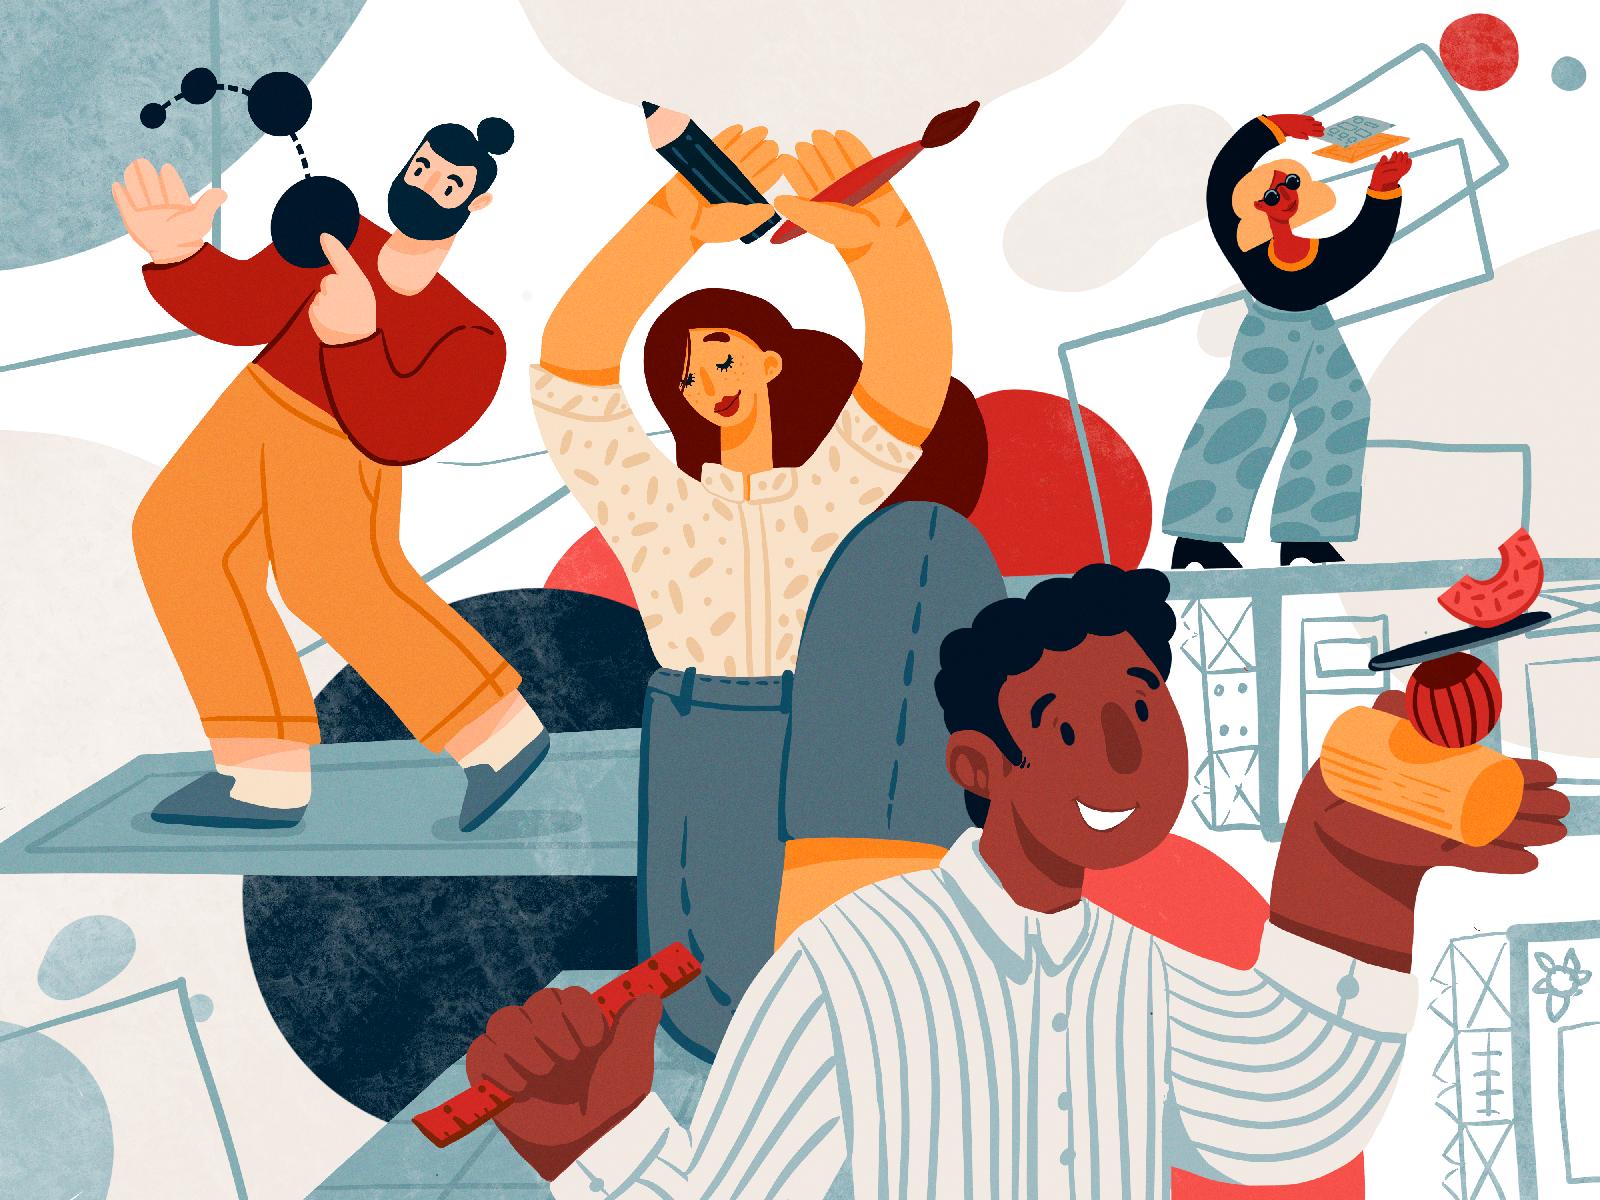 Designers Diversity Illustration